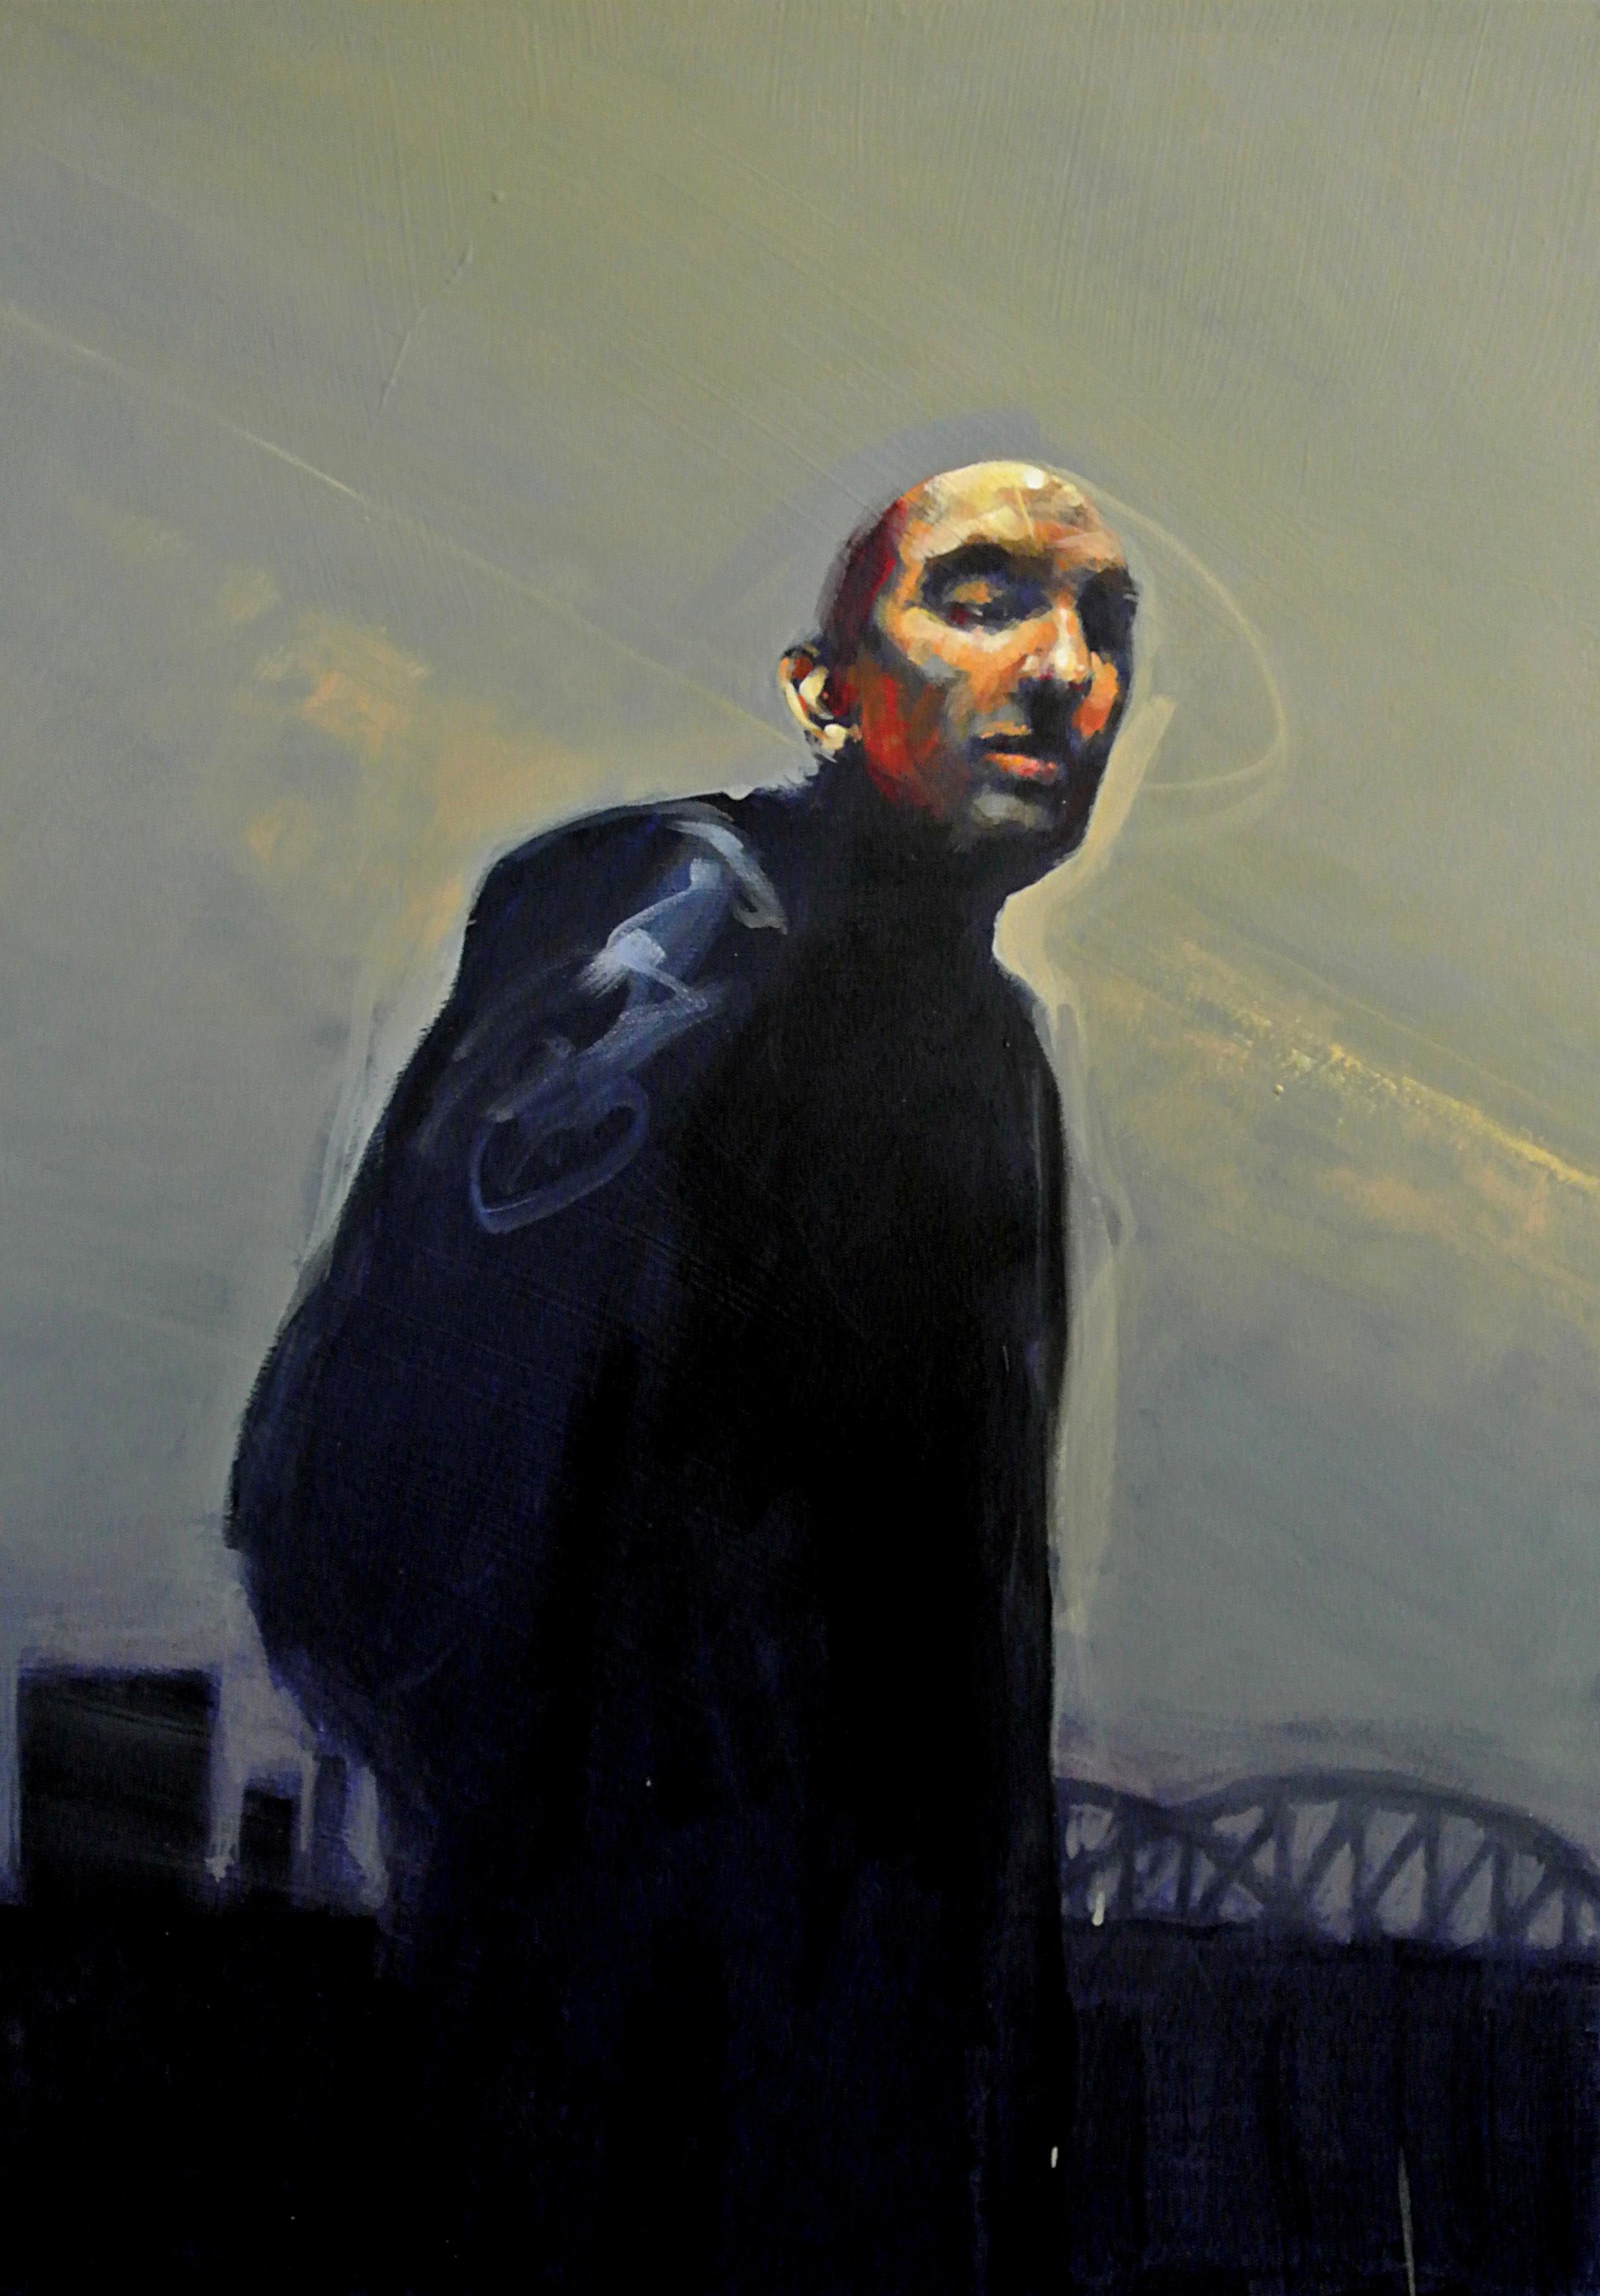 Asphalt  poetry - acrylic -70 x 50 - 3 March 2013